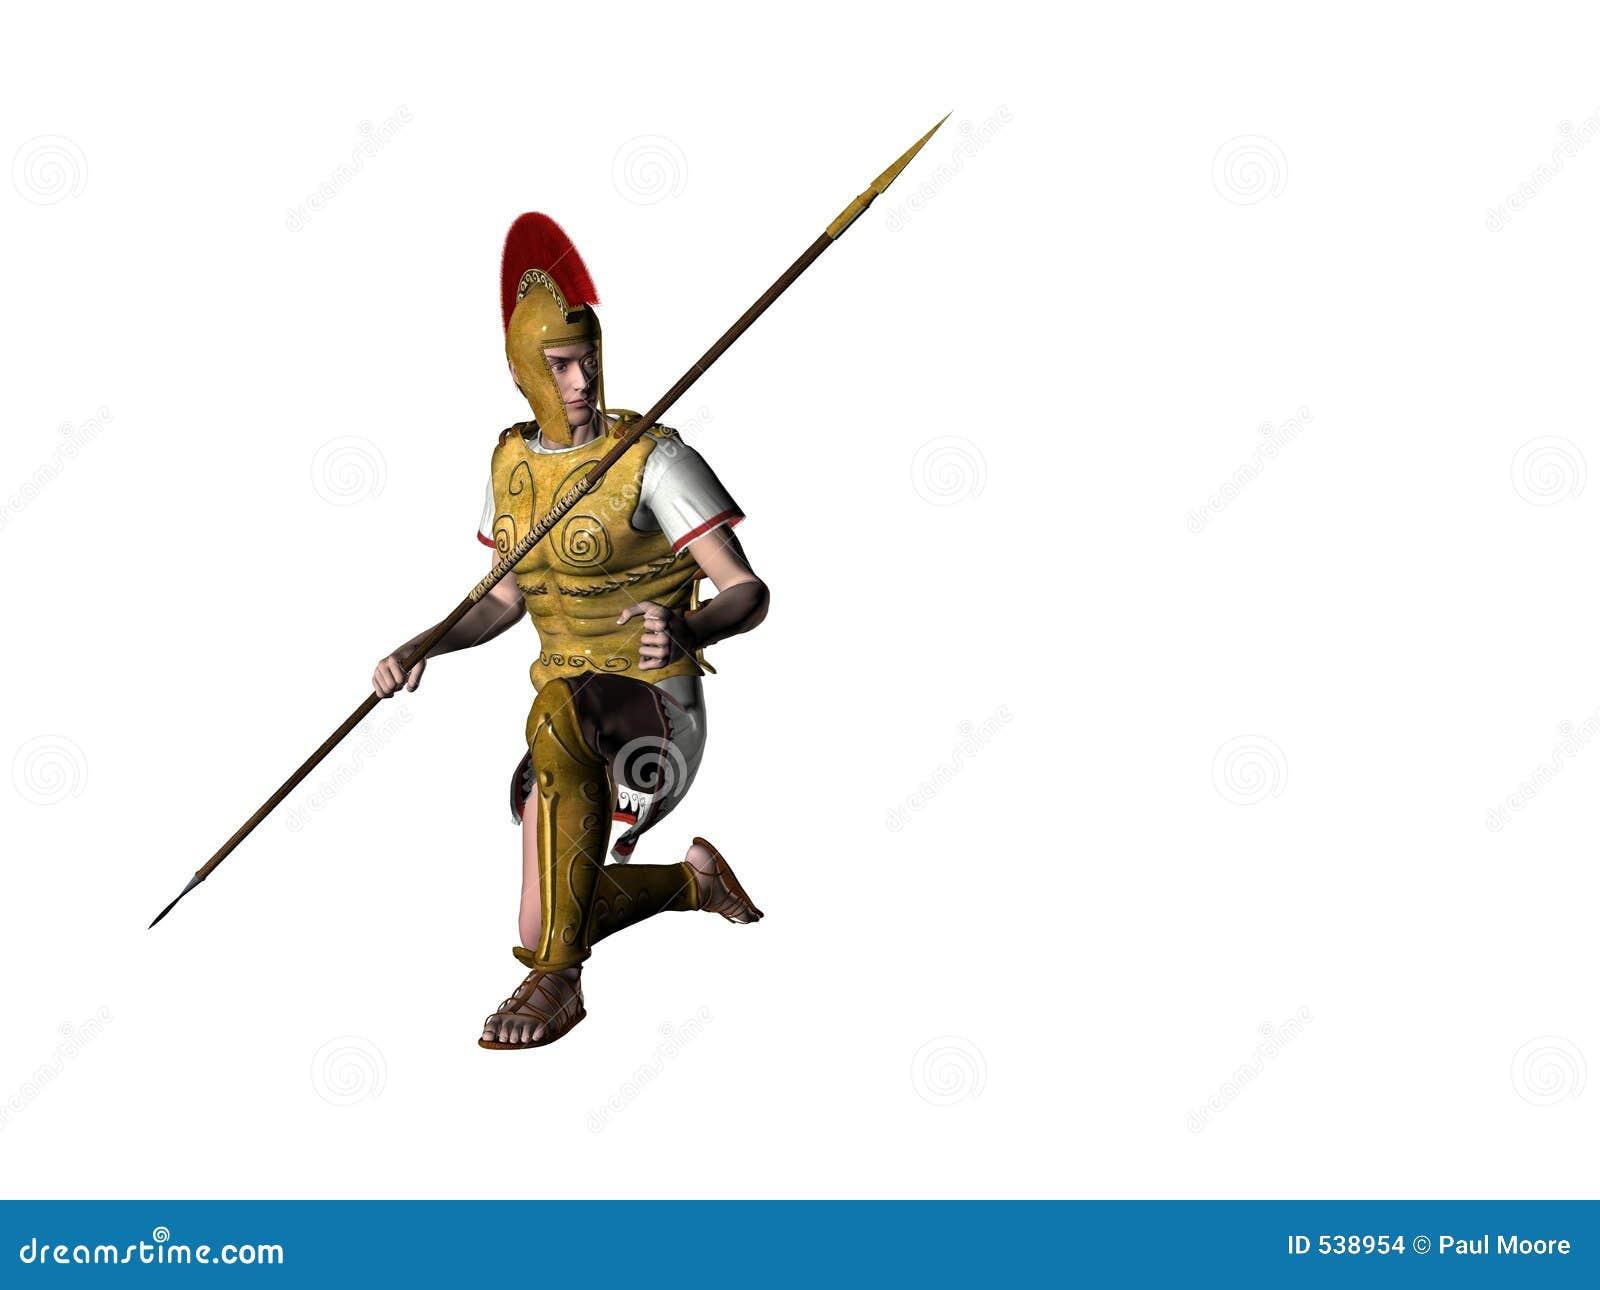 Download 13希腊战士 库存例证. 插画 包括有 盖子, 欧洲, 战争, 时间, 保护, 可怕, 强大, 中世纪, 镇痛药 - 538954